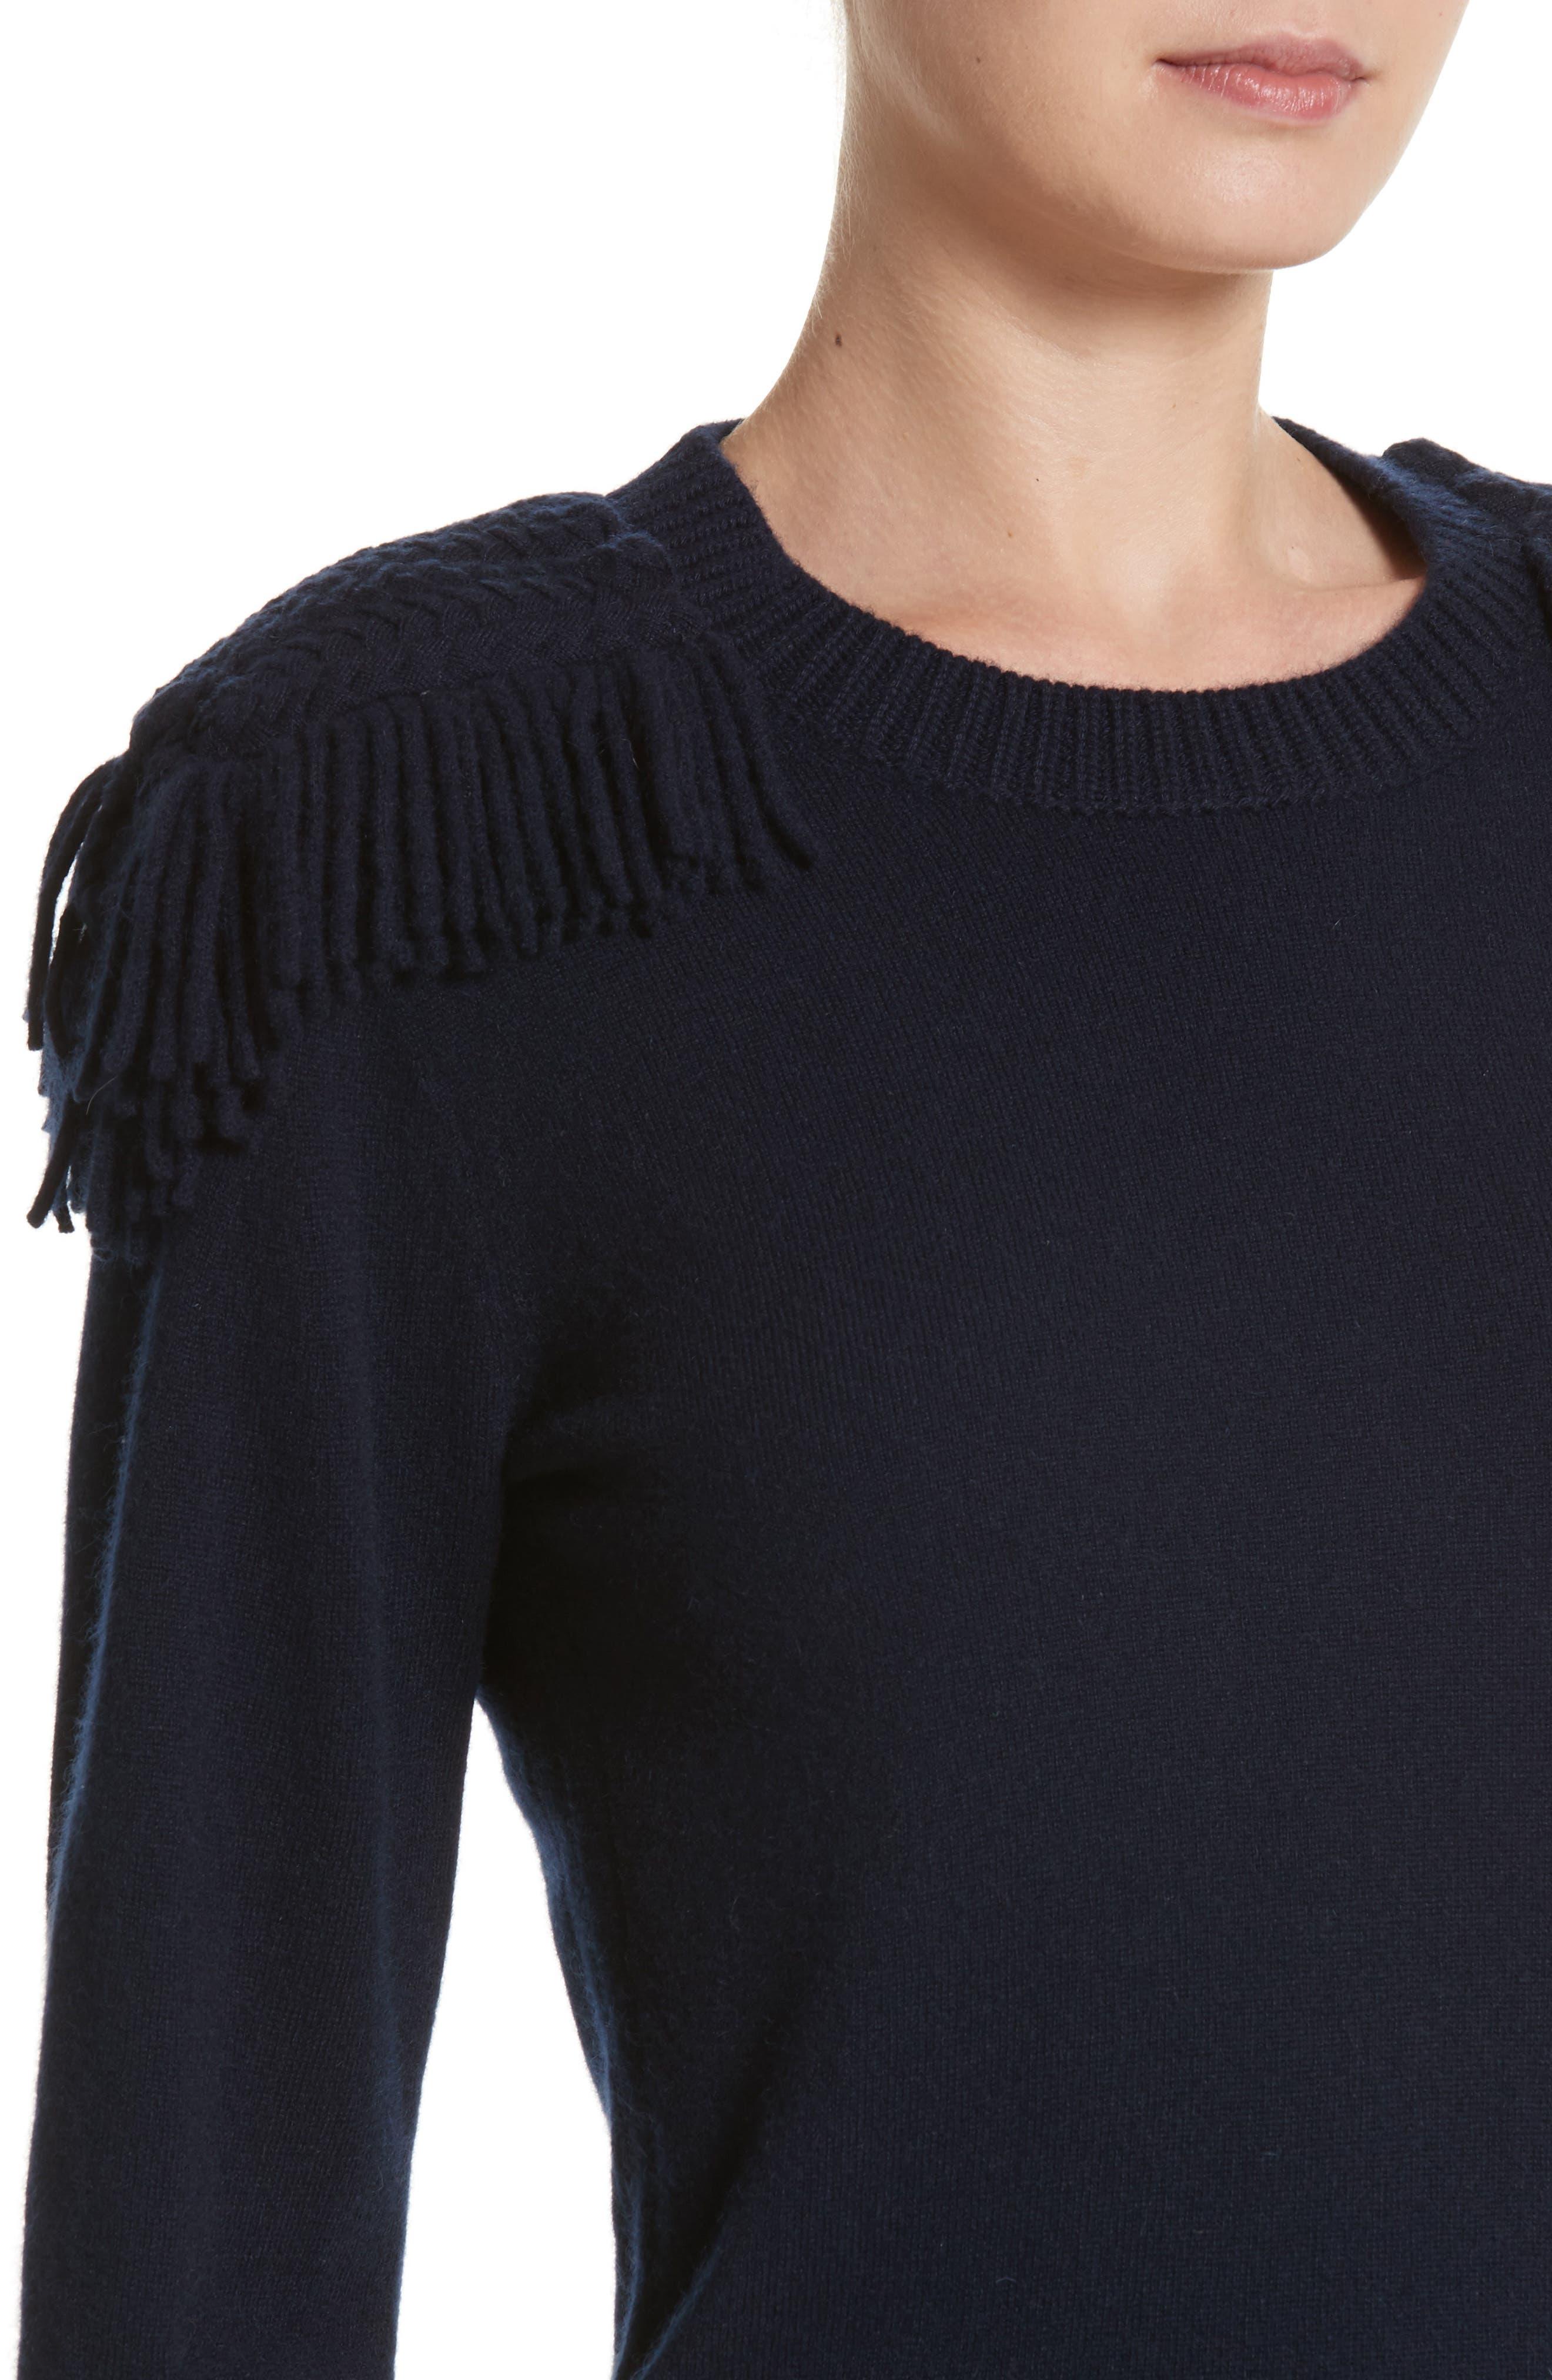 Livenza Wool & Cashmere Fringe Sweater,                             Alternate thumbnail 4, color,                             410